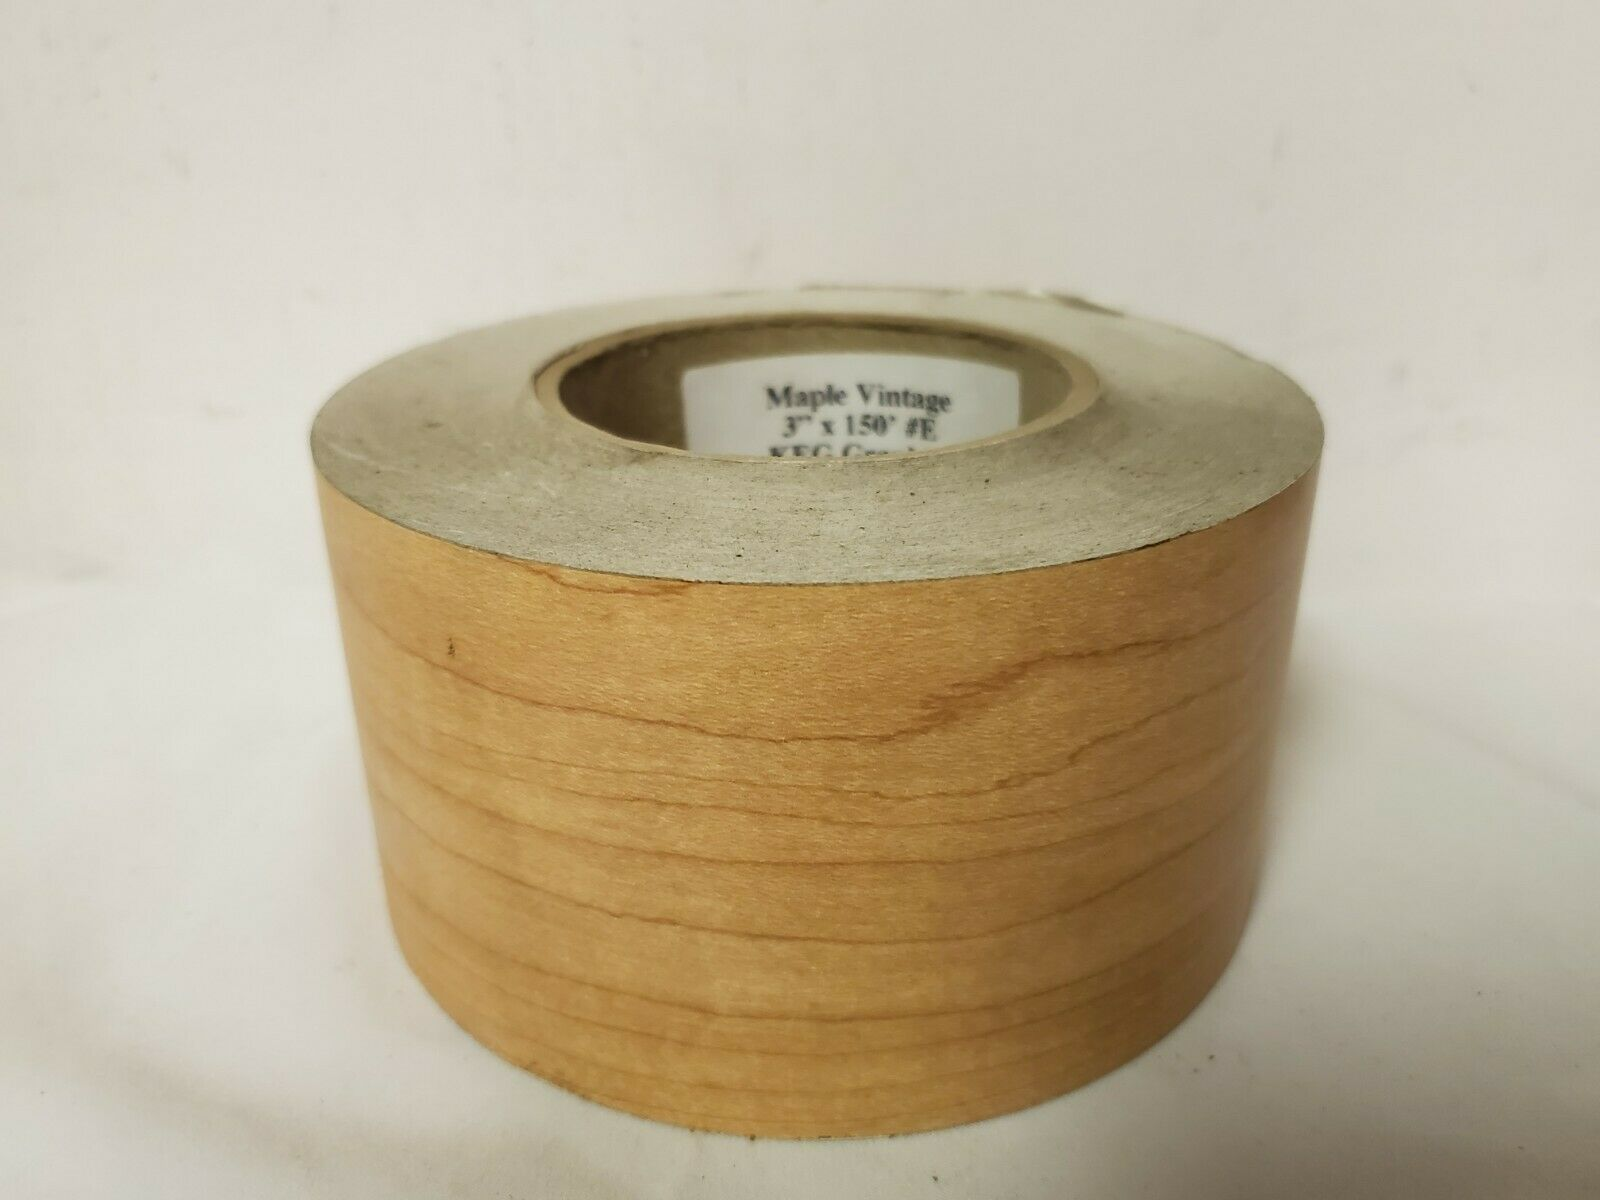 Rv Trailer Camper Home Paneling 3 Quot X 150 Trim Seam Tape